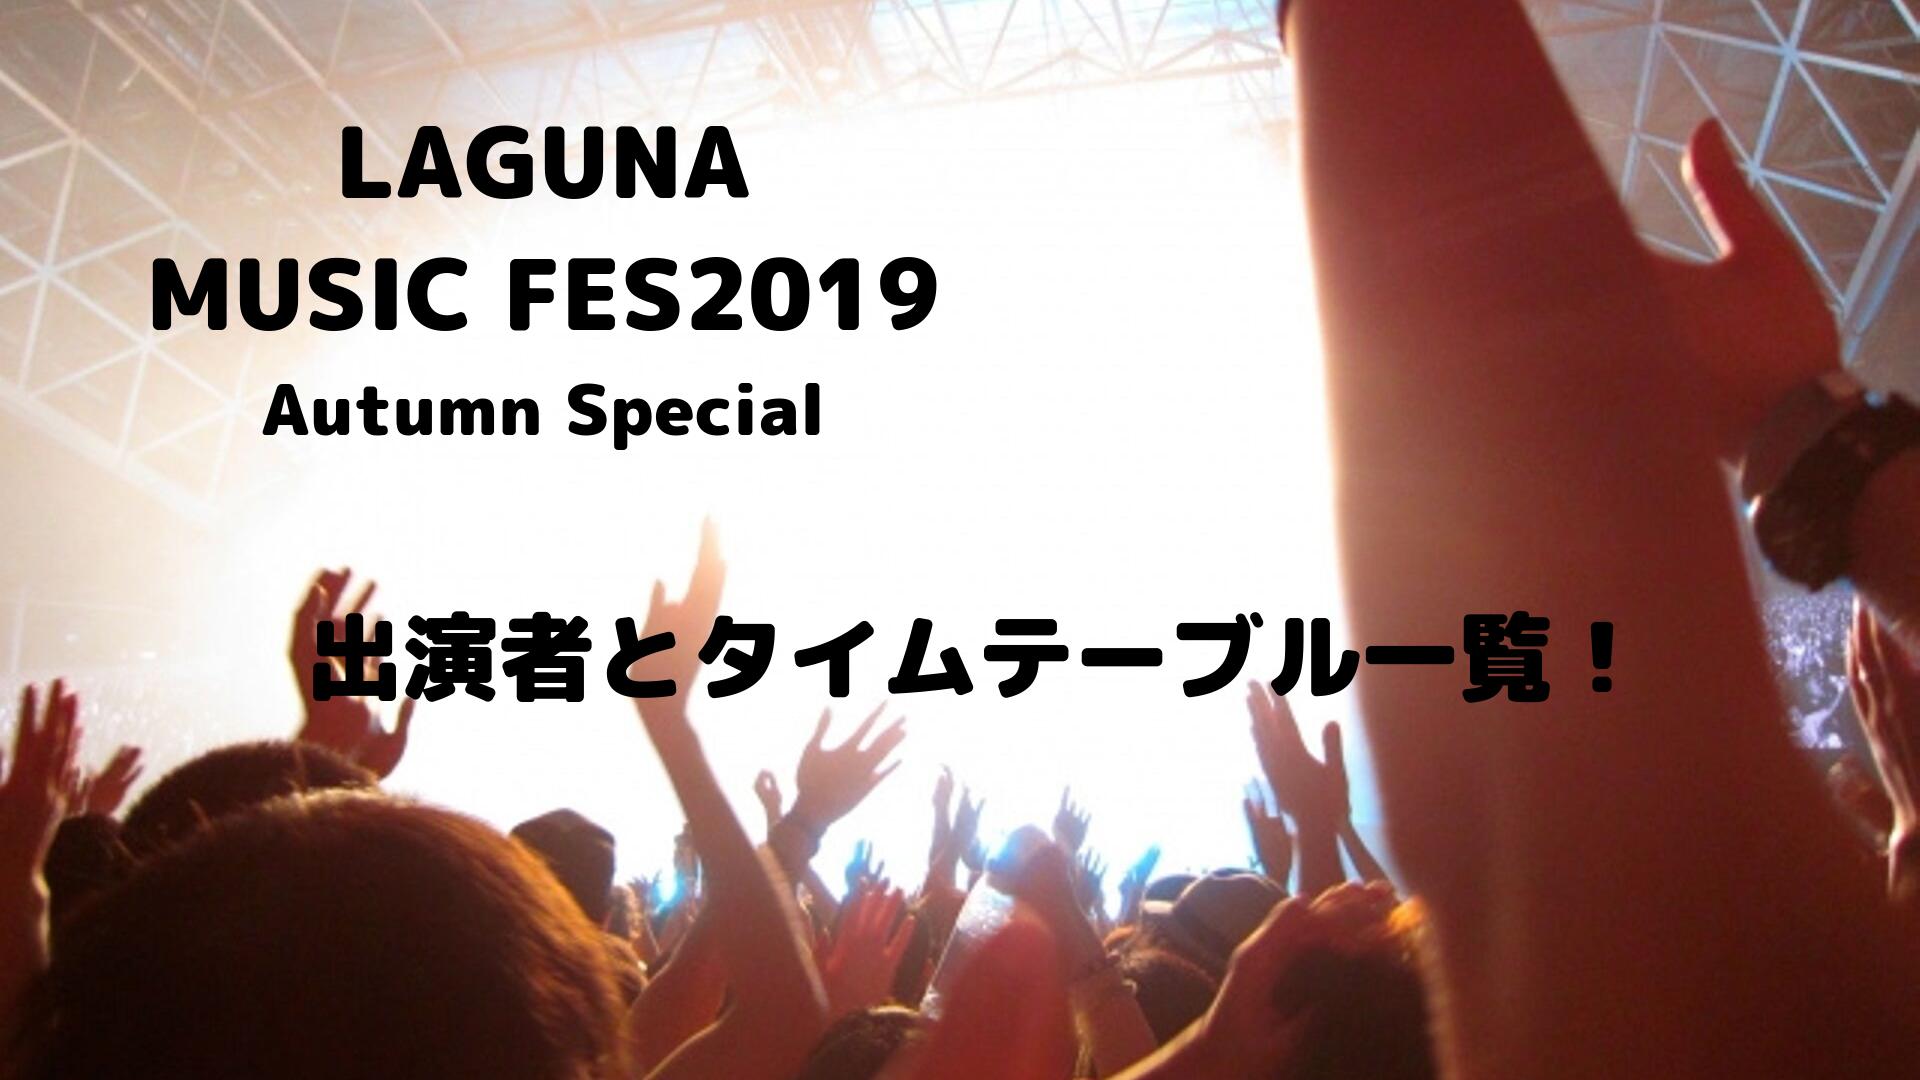 LAGUNA MUSIC FES 2019